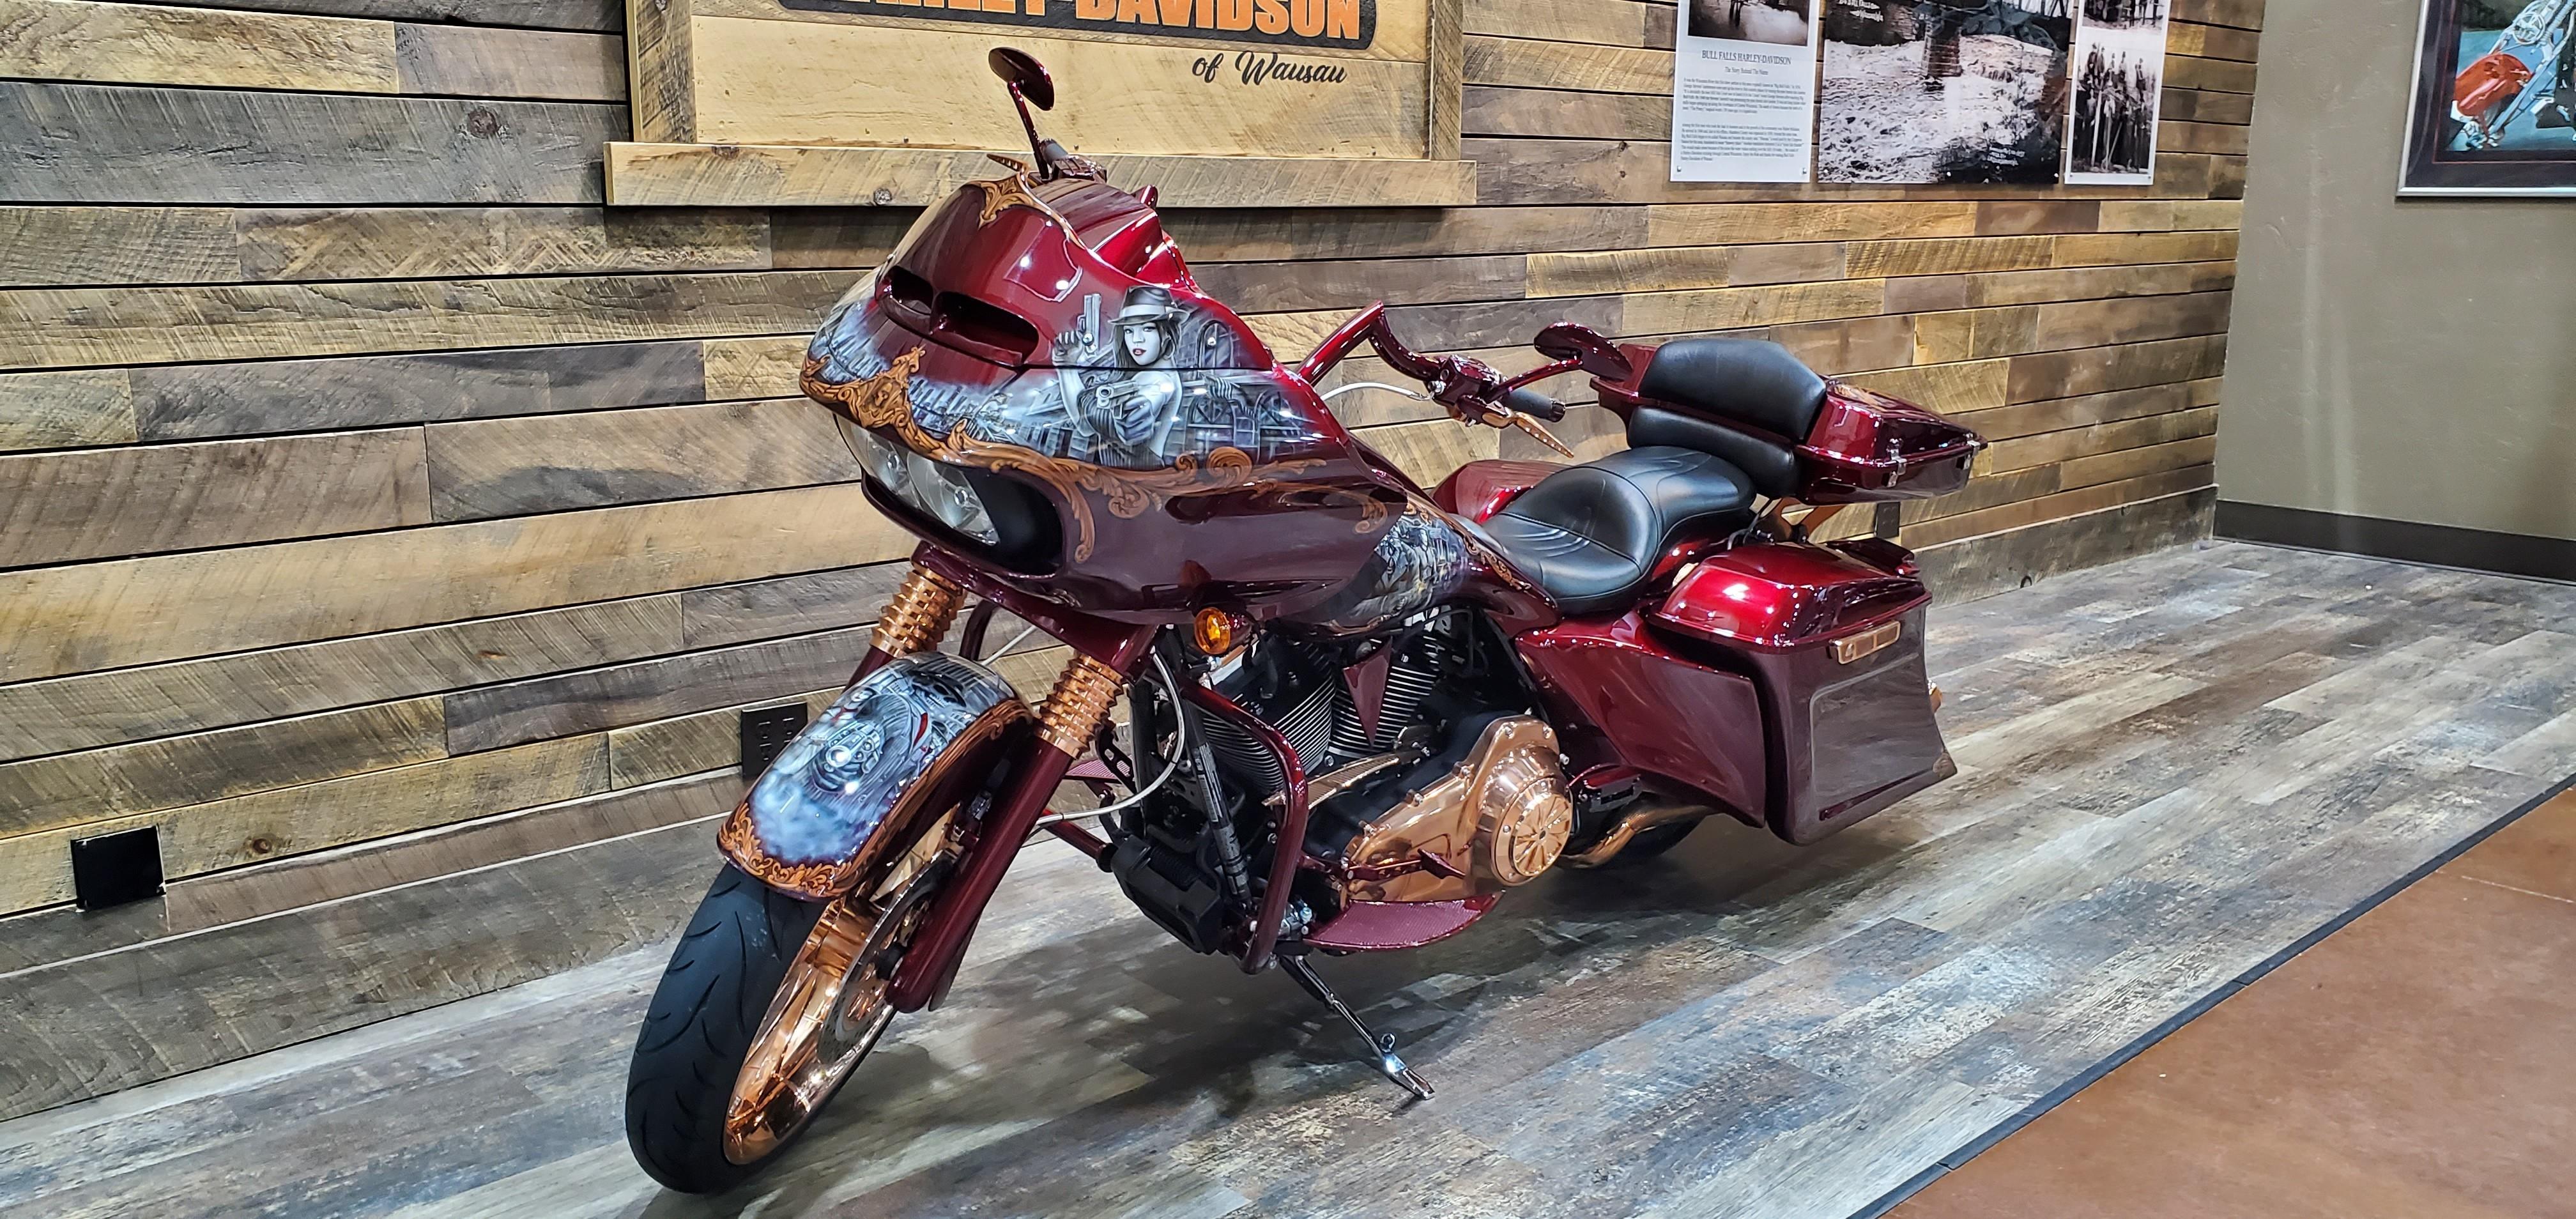 2015 Harley-Davidson Road Glide Special Special at Bull Falls Harley-Davidson